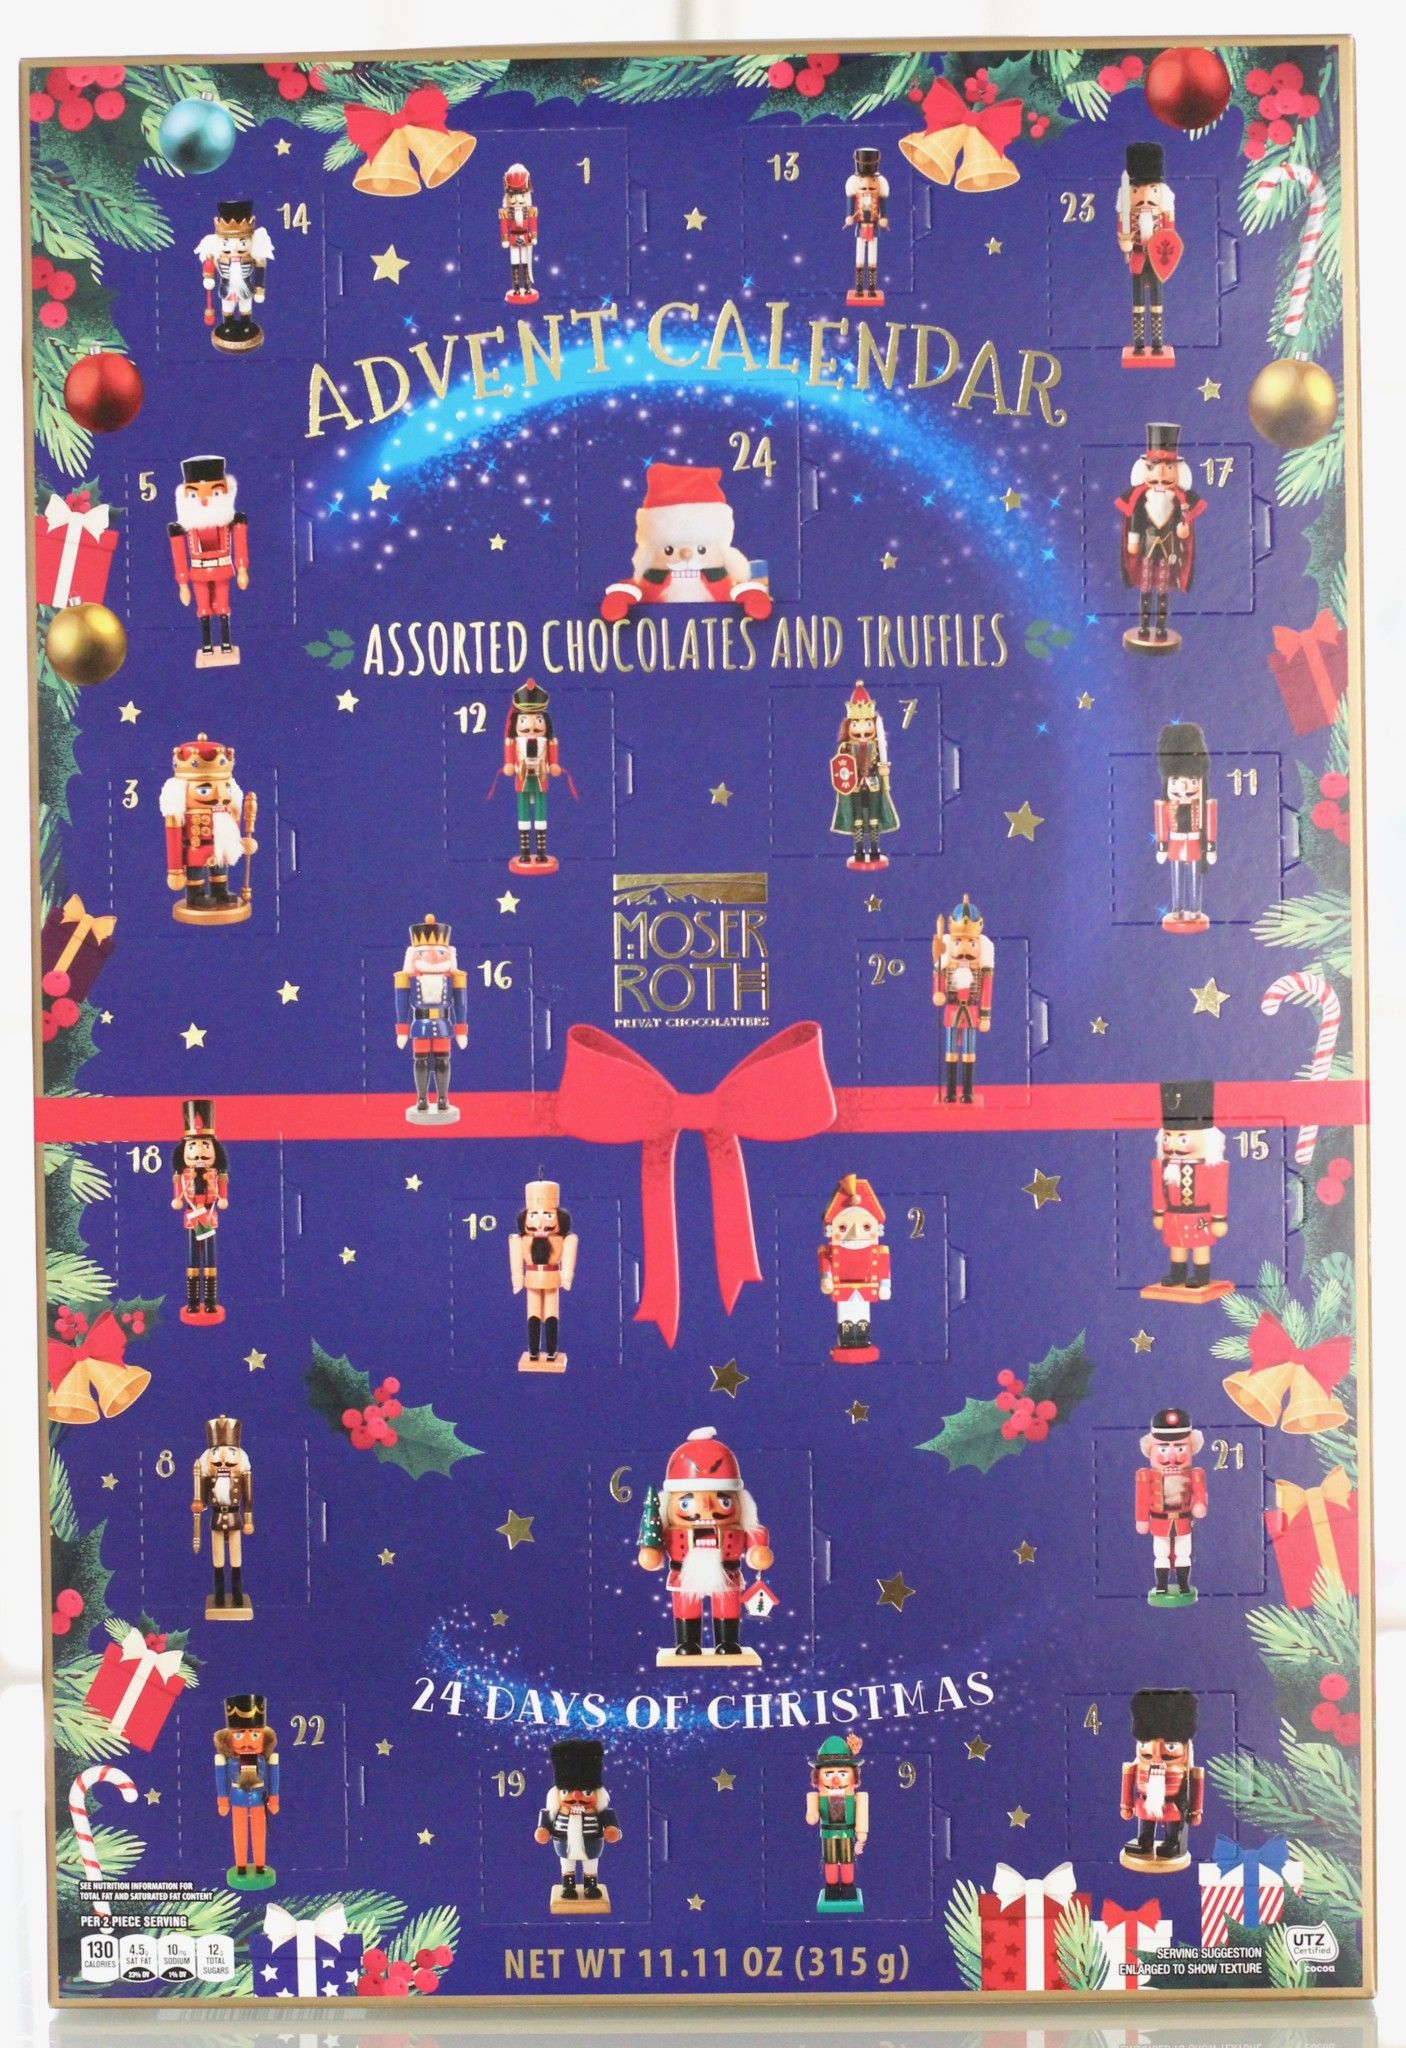 Aldi 2019 Moser Roth Nutcracker Advent Calendar The Homespun Chics Chocolate Calendar Chocolate Assortment Aldi